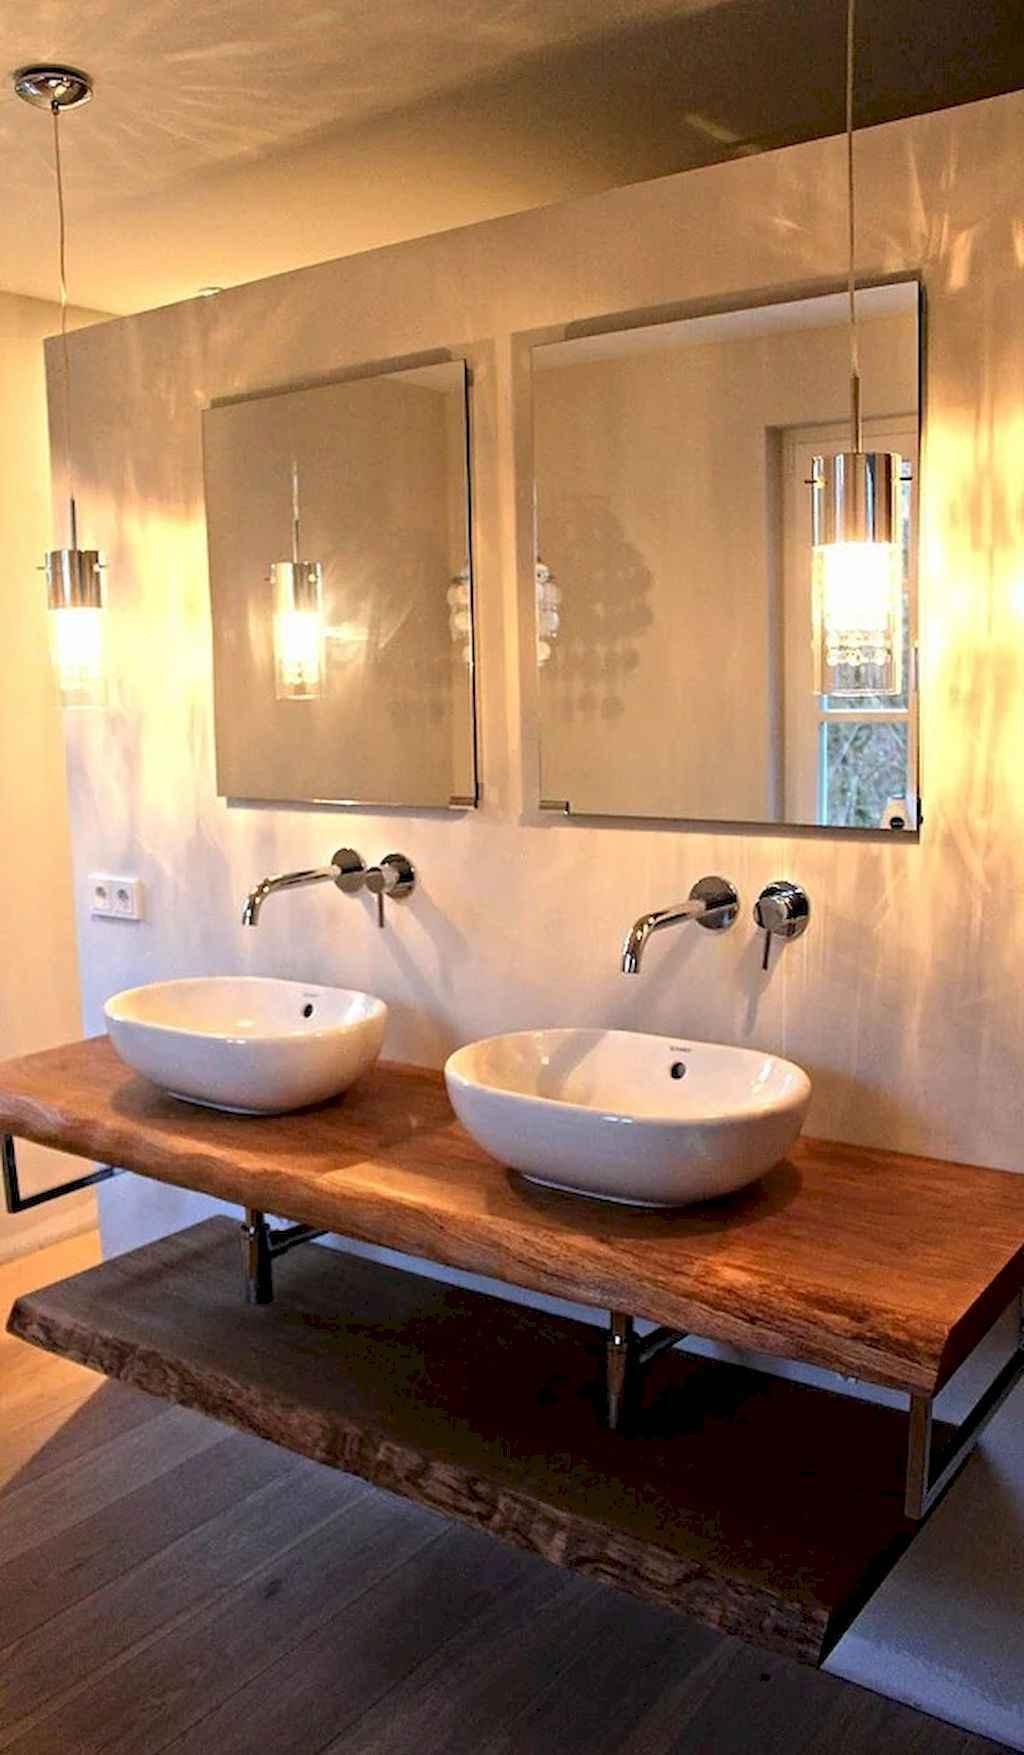 125 awesome farmhouse bathroom vanity remodel ideas (39)